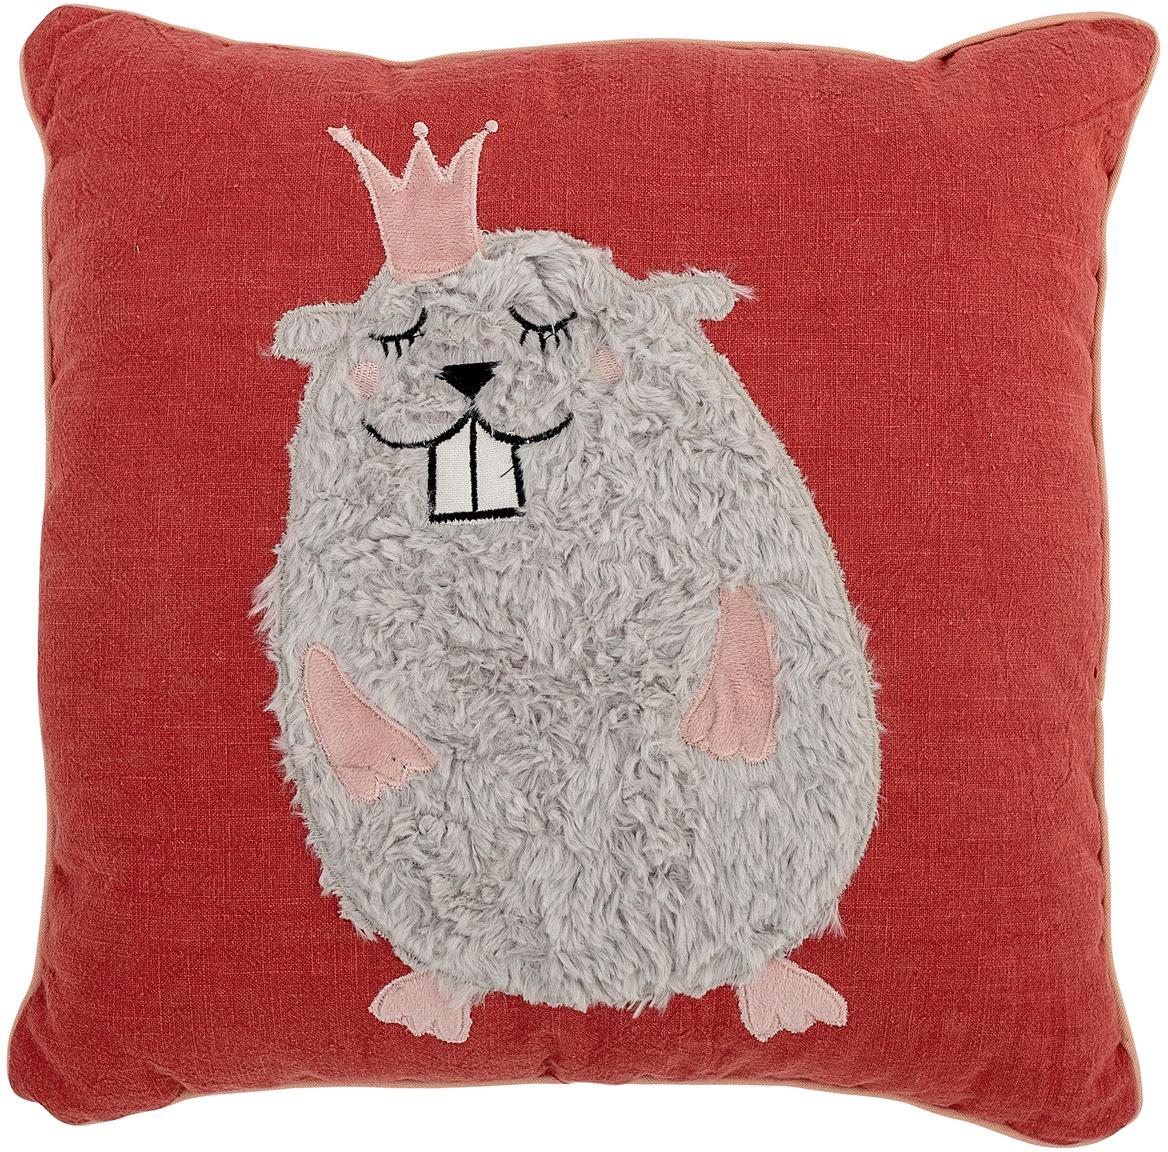 Cojín Hamster, Tapizado: 70%algodón, 30%poliéste, Rojo, gris, salmón, An 40 x L 40 cm